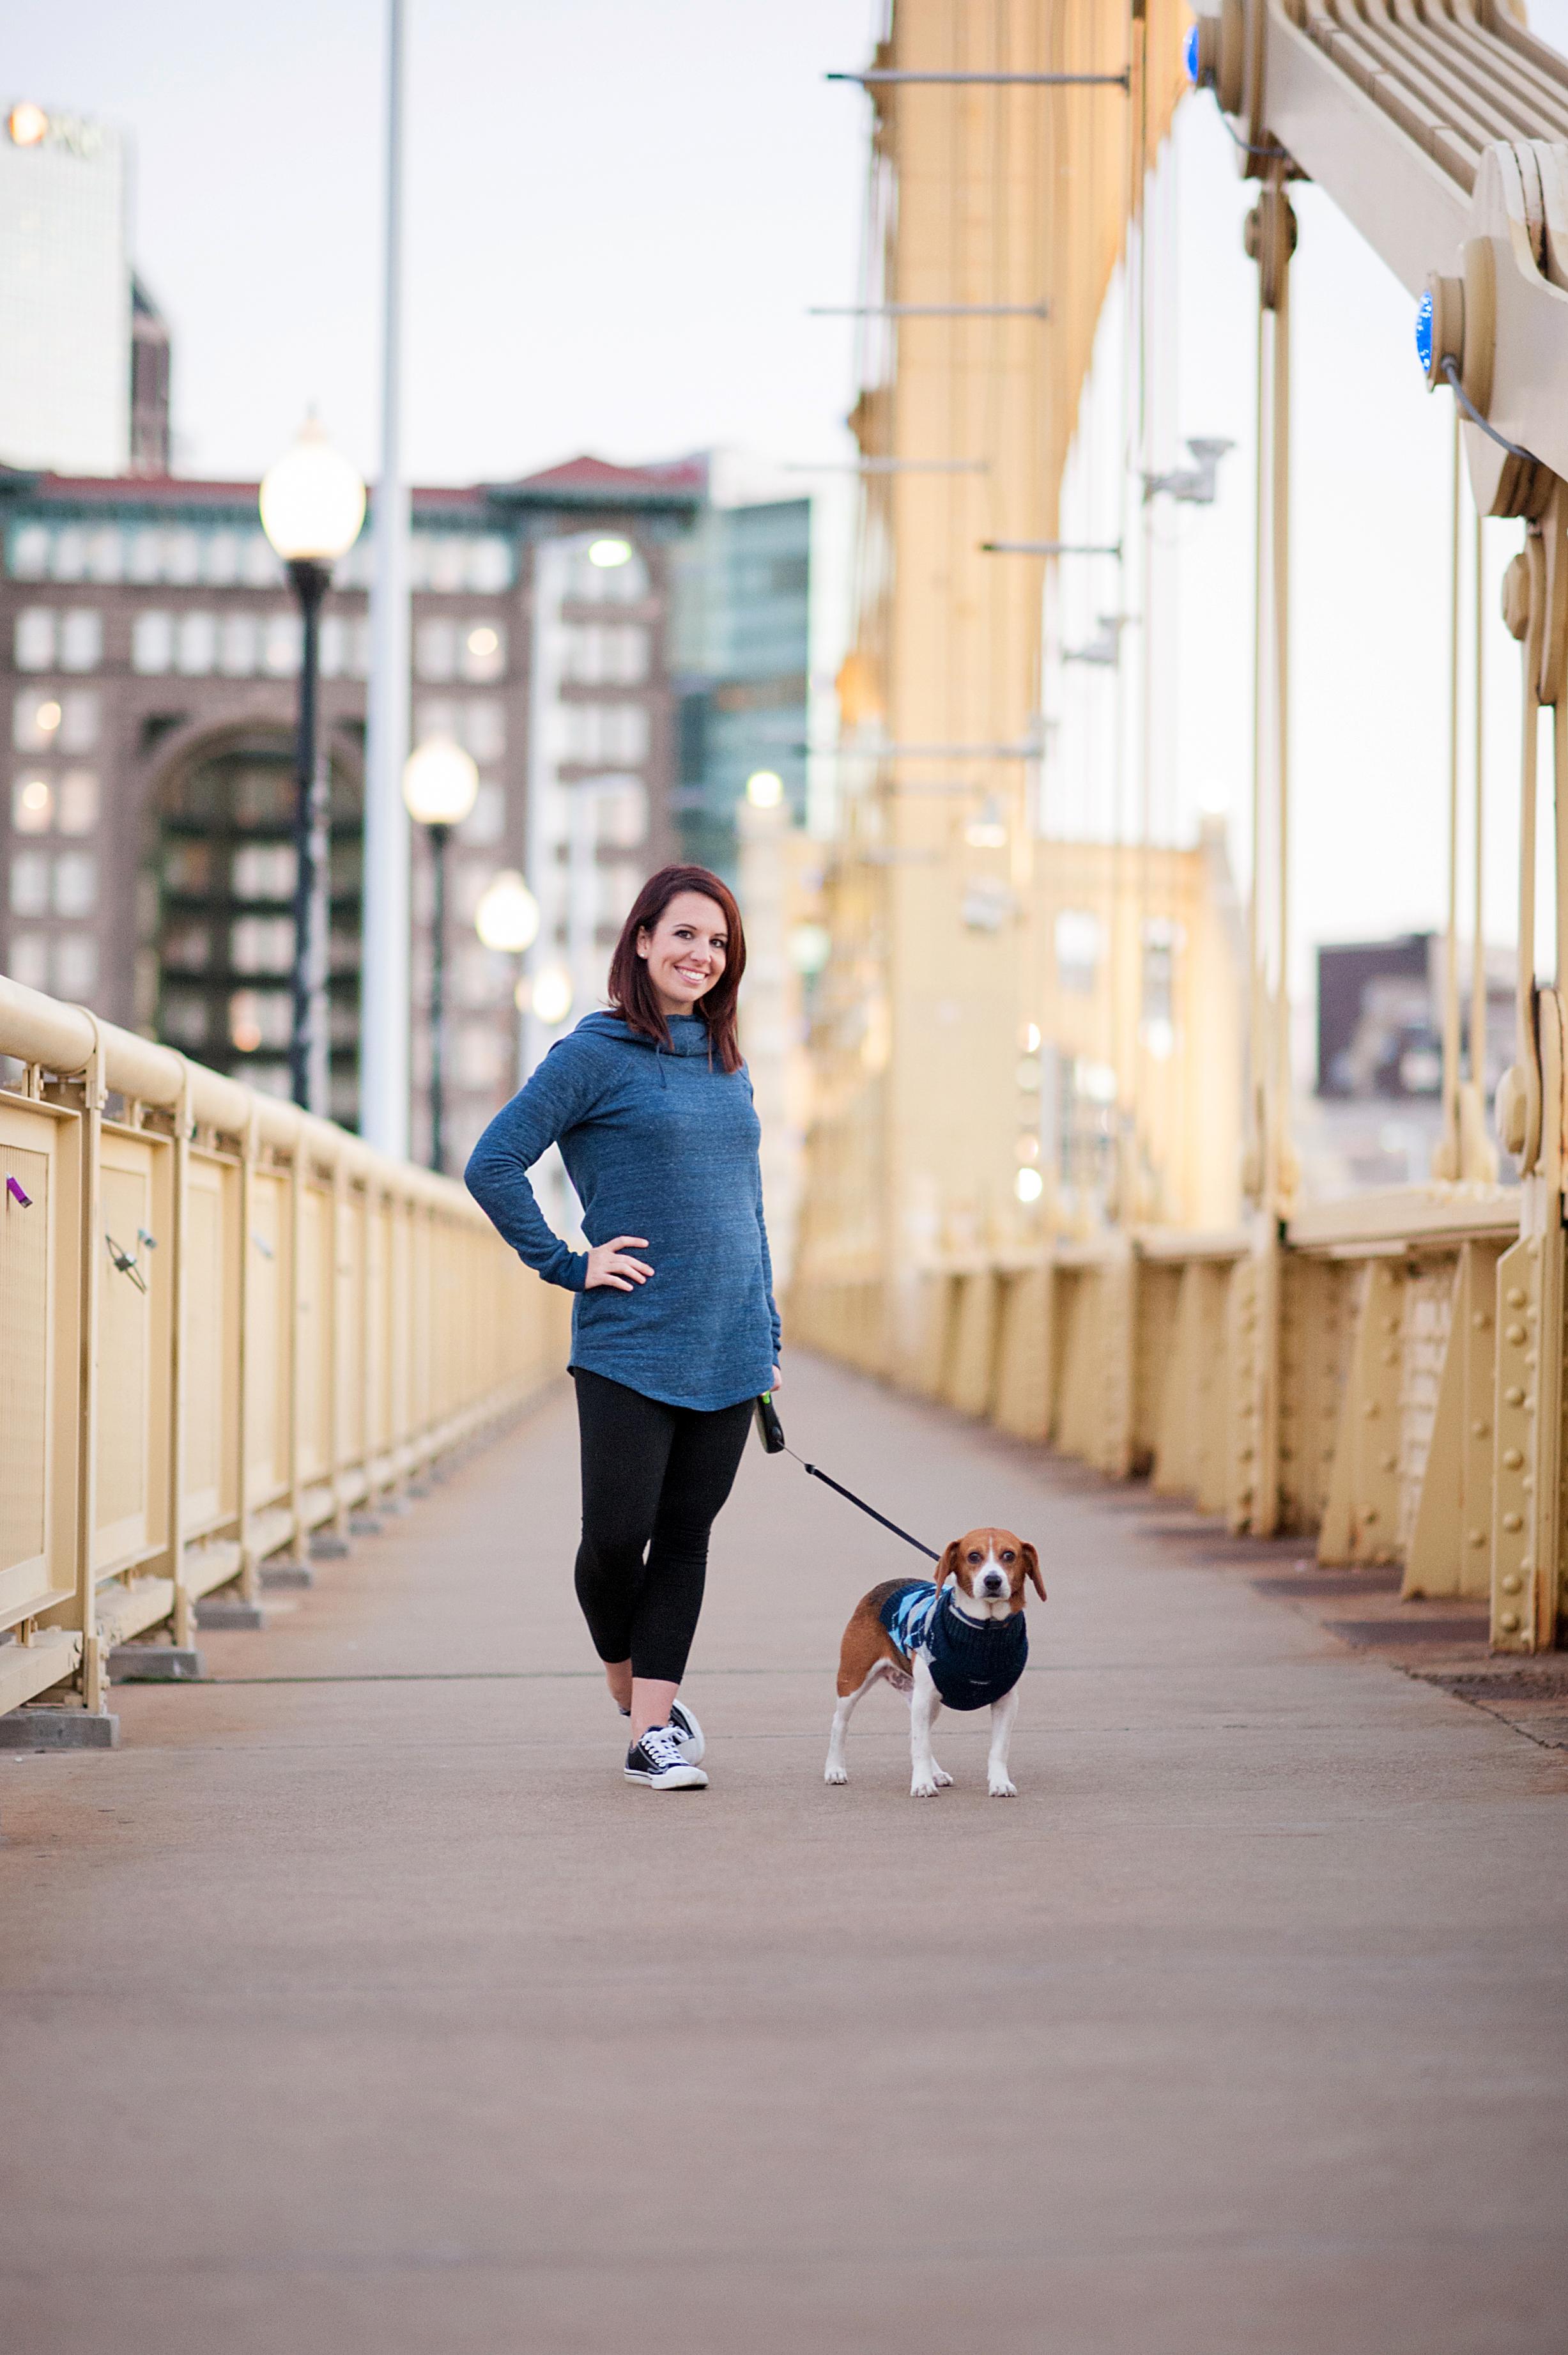 dexter jack-a-bee dog photography pittsburgh 030.jpg